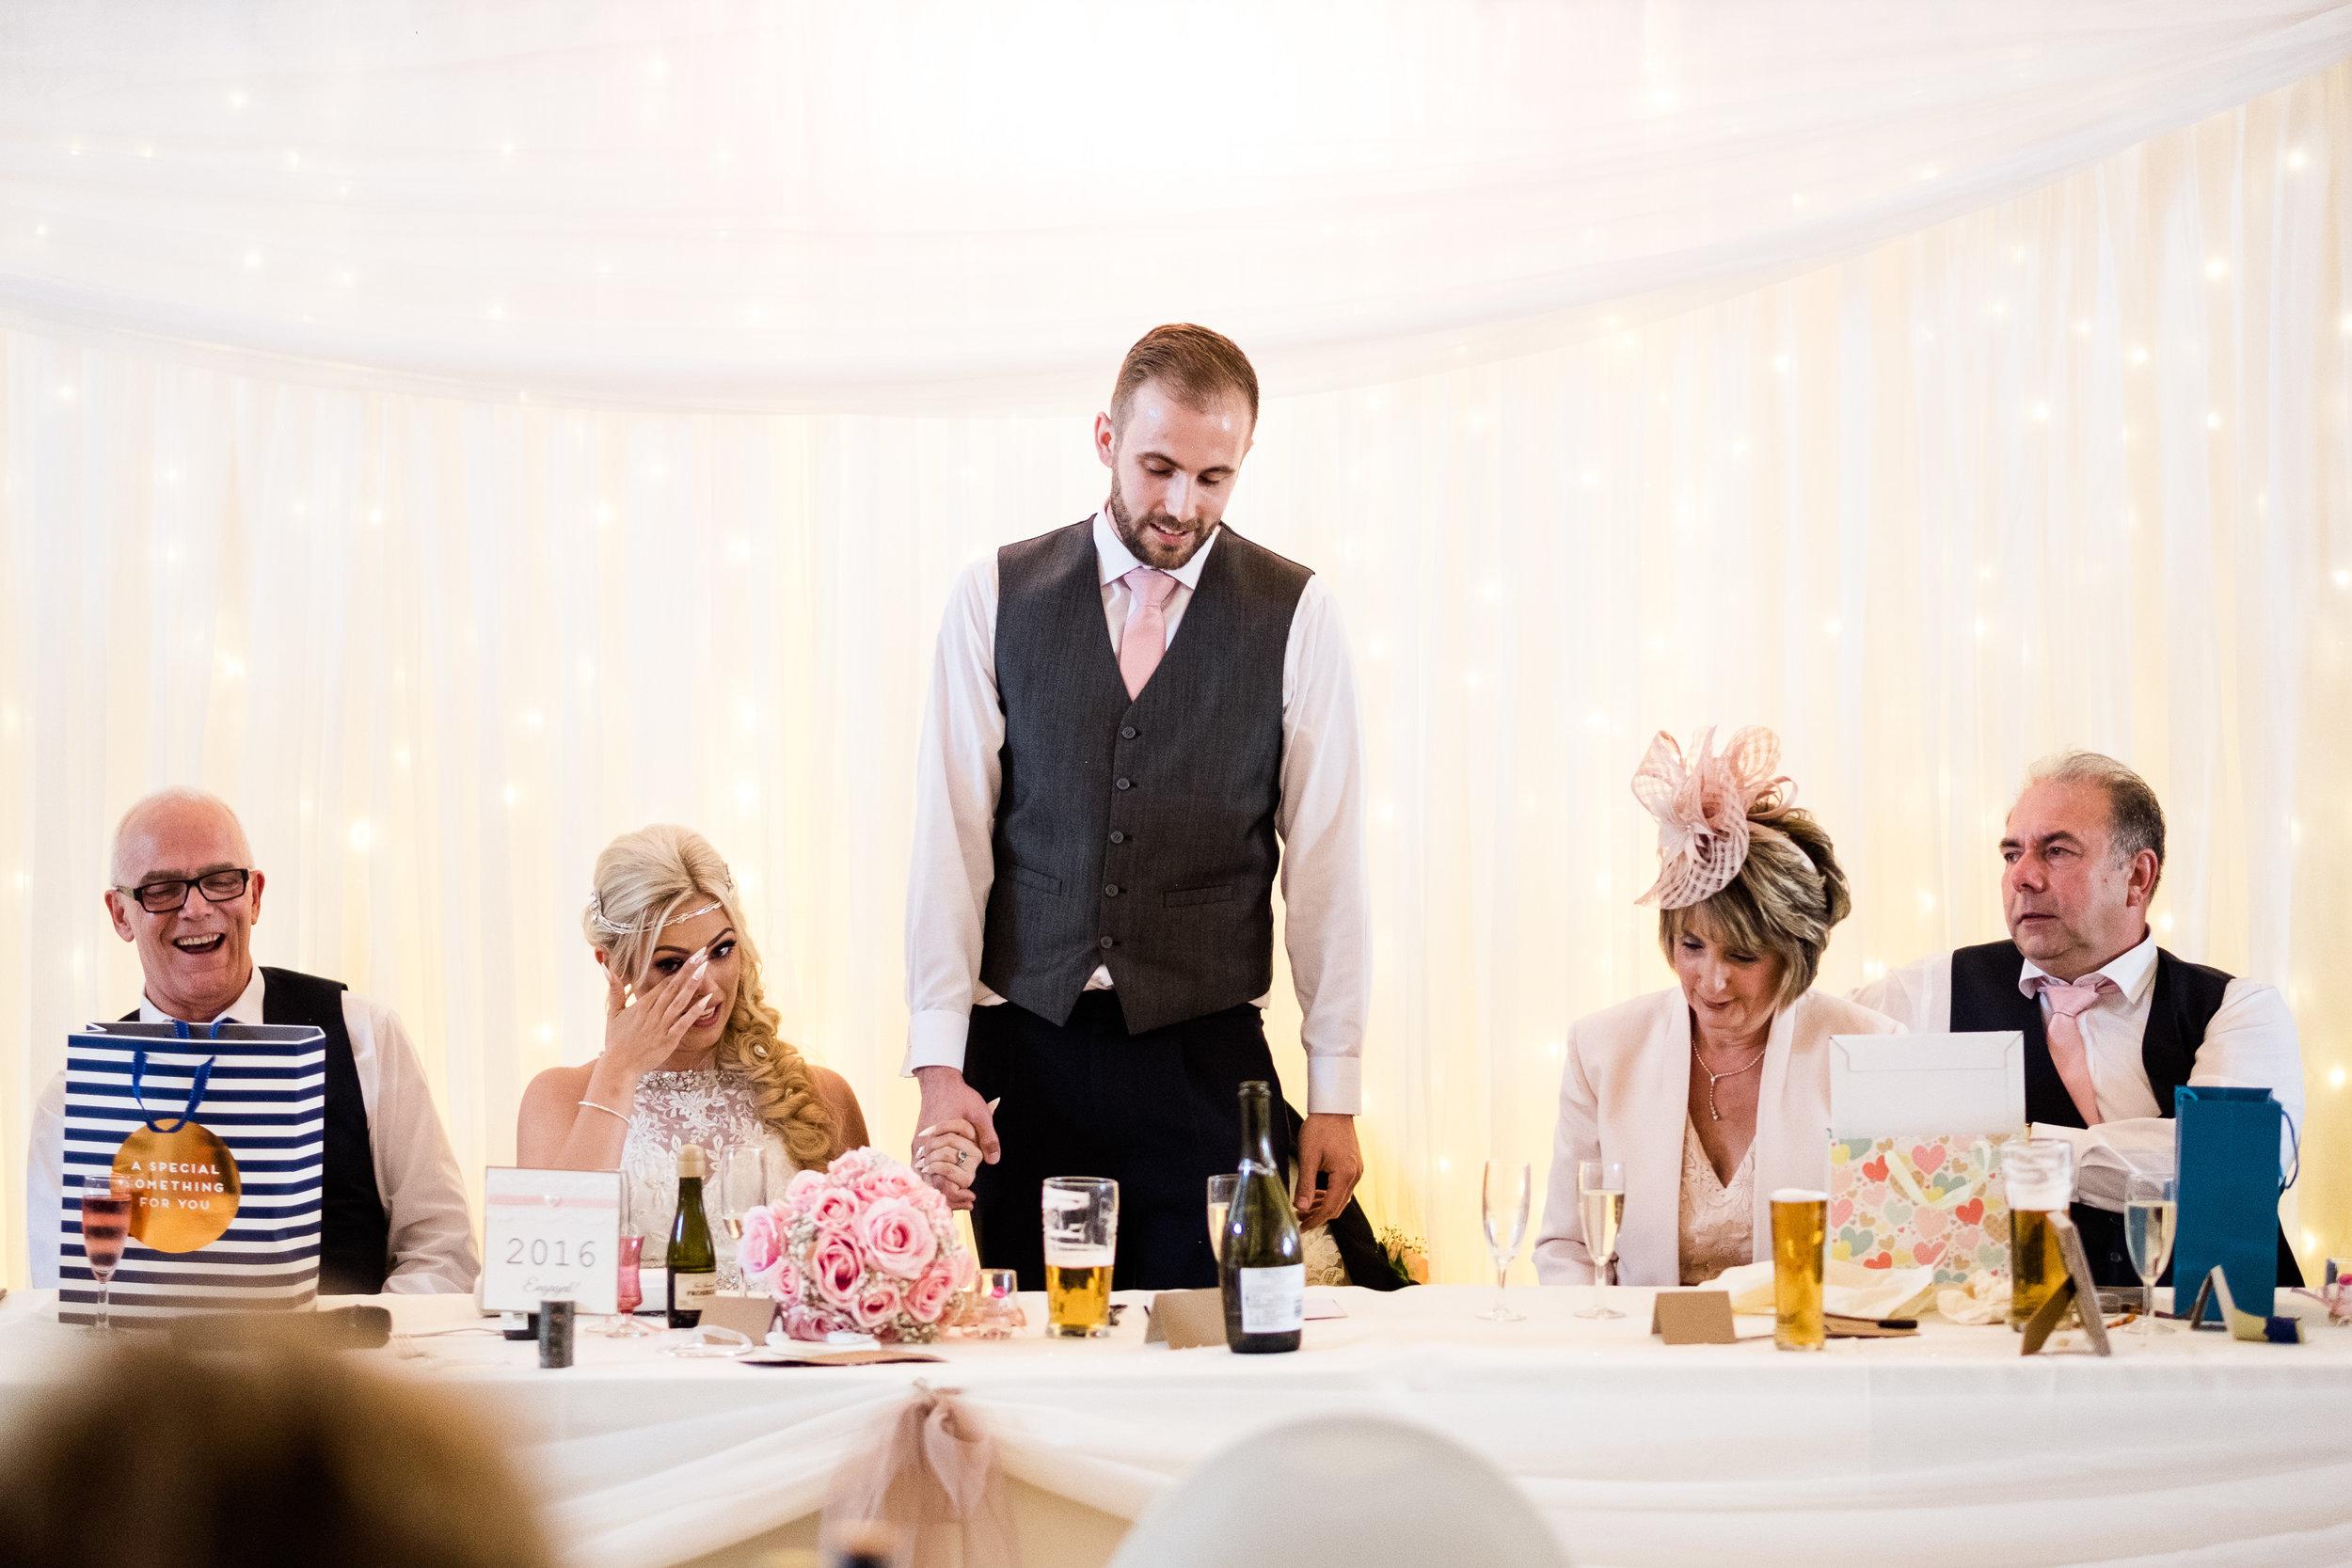 Summer Documentary Wedding Photography Floral Hall, Stoke-on-Trent, Staffordshire - Jenny Harper-49.jpg